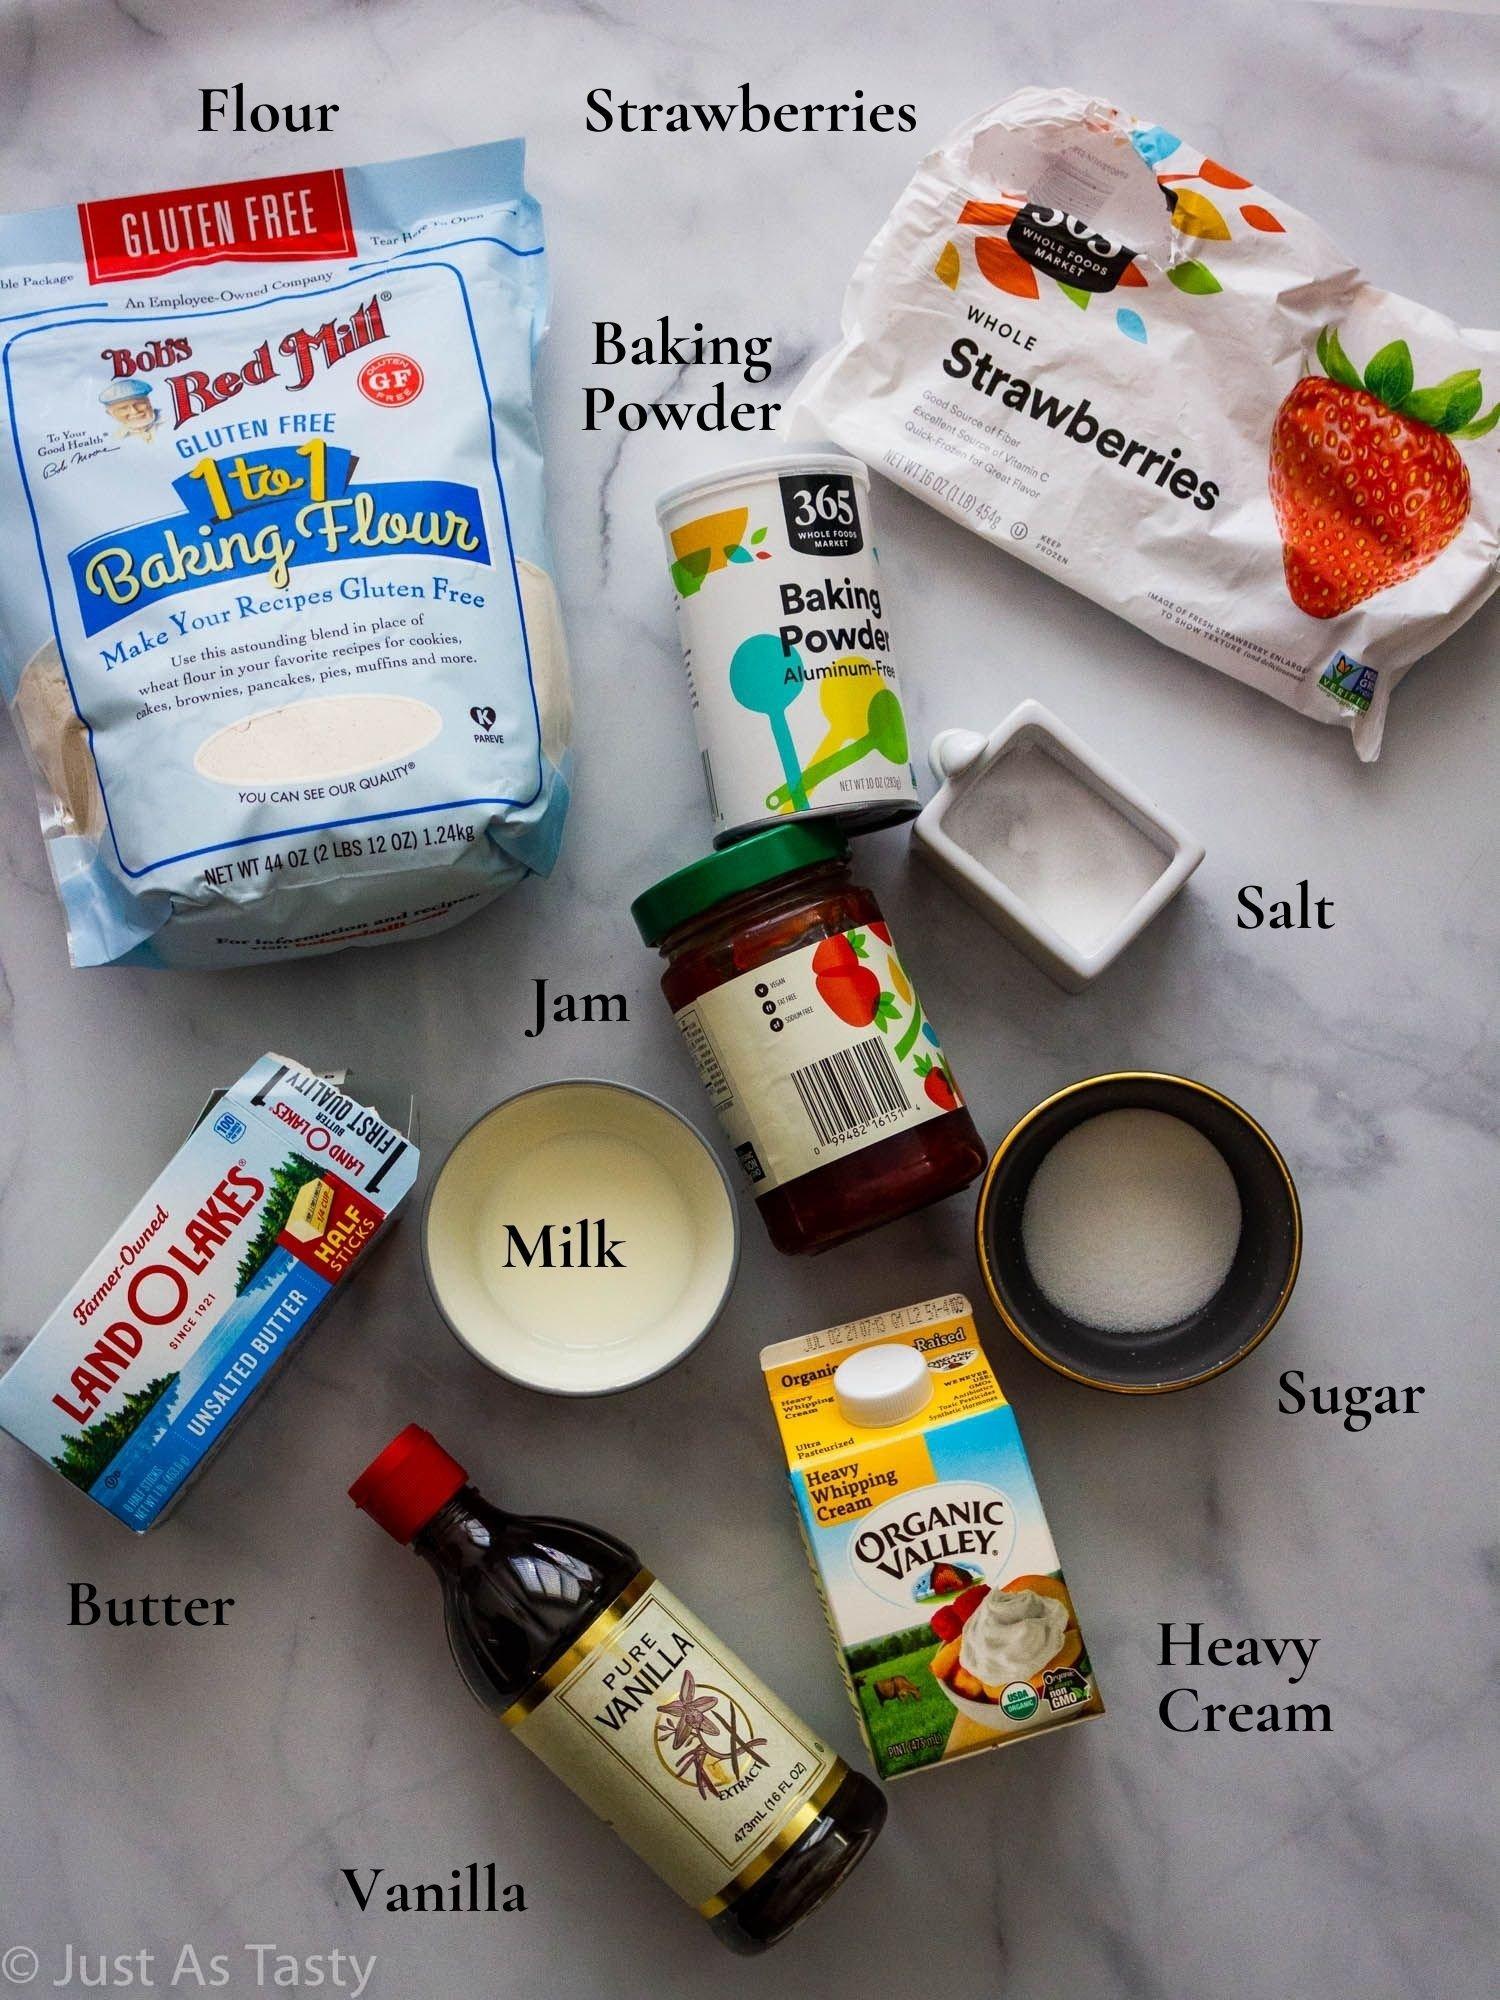 Strawberry shortcake ingredients.